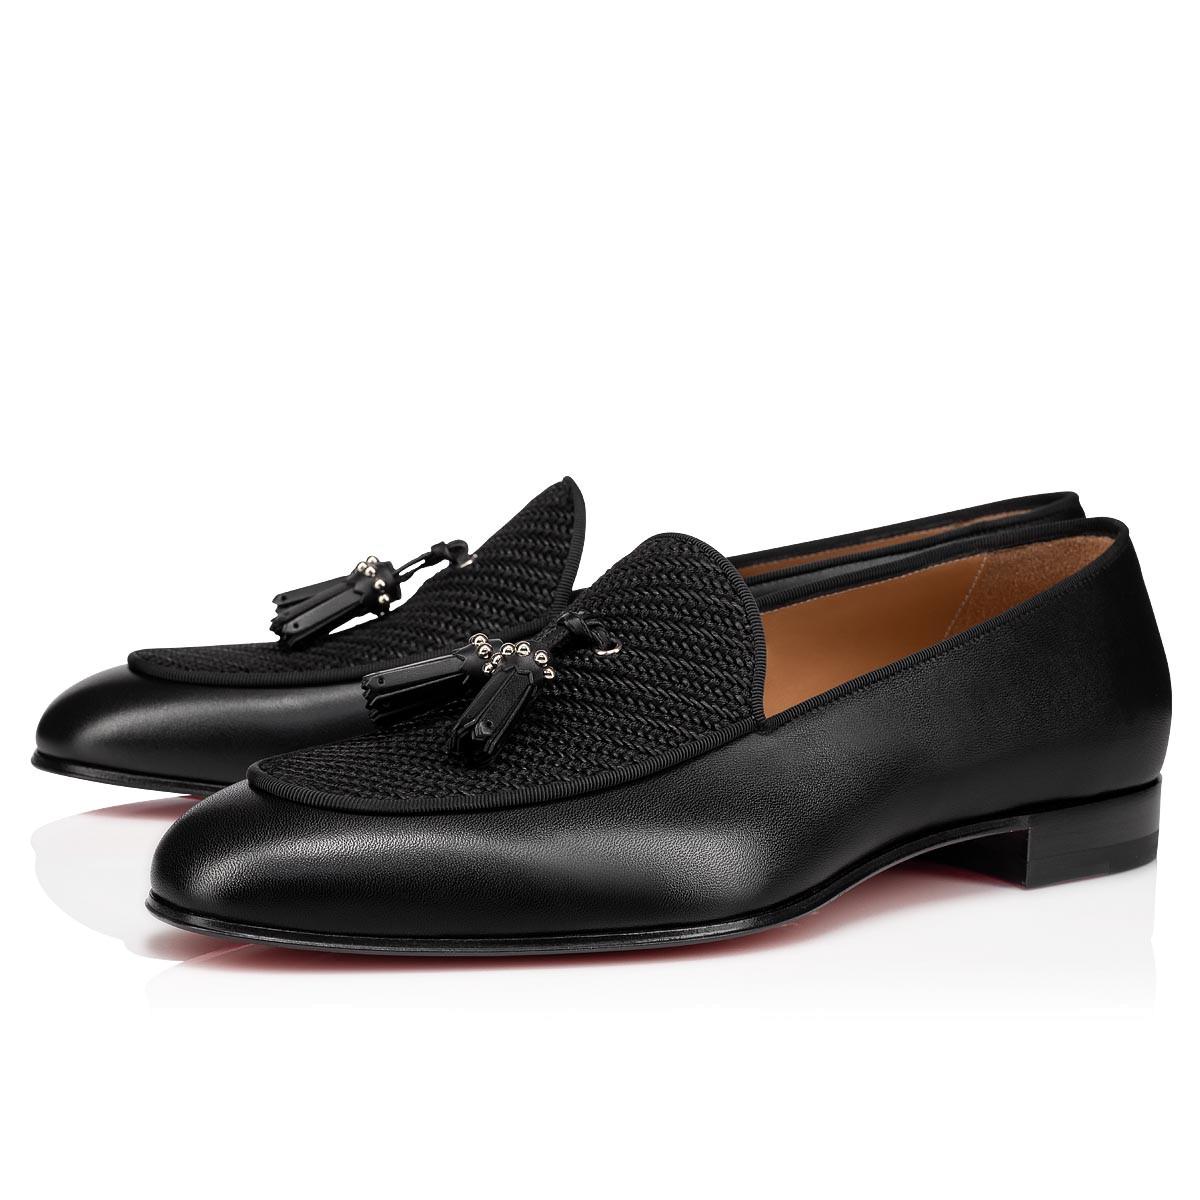 Shoes - Nile King - Christian Louboutin